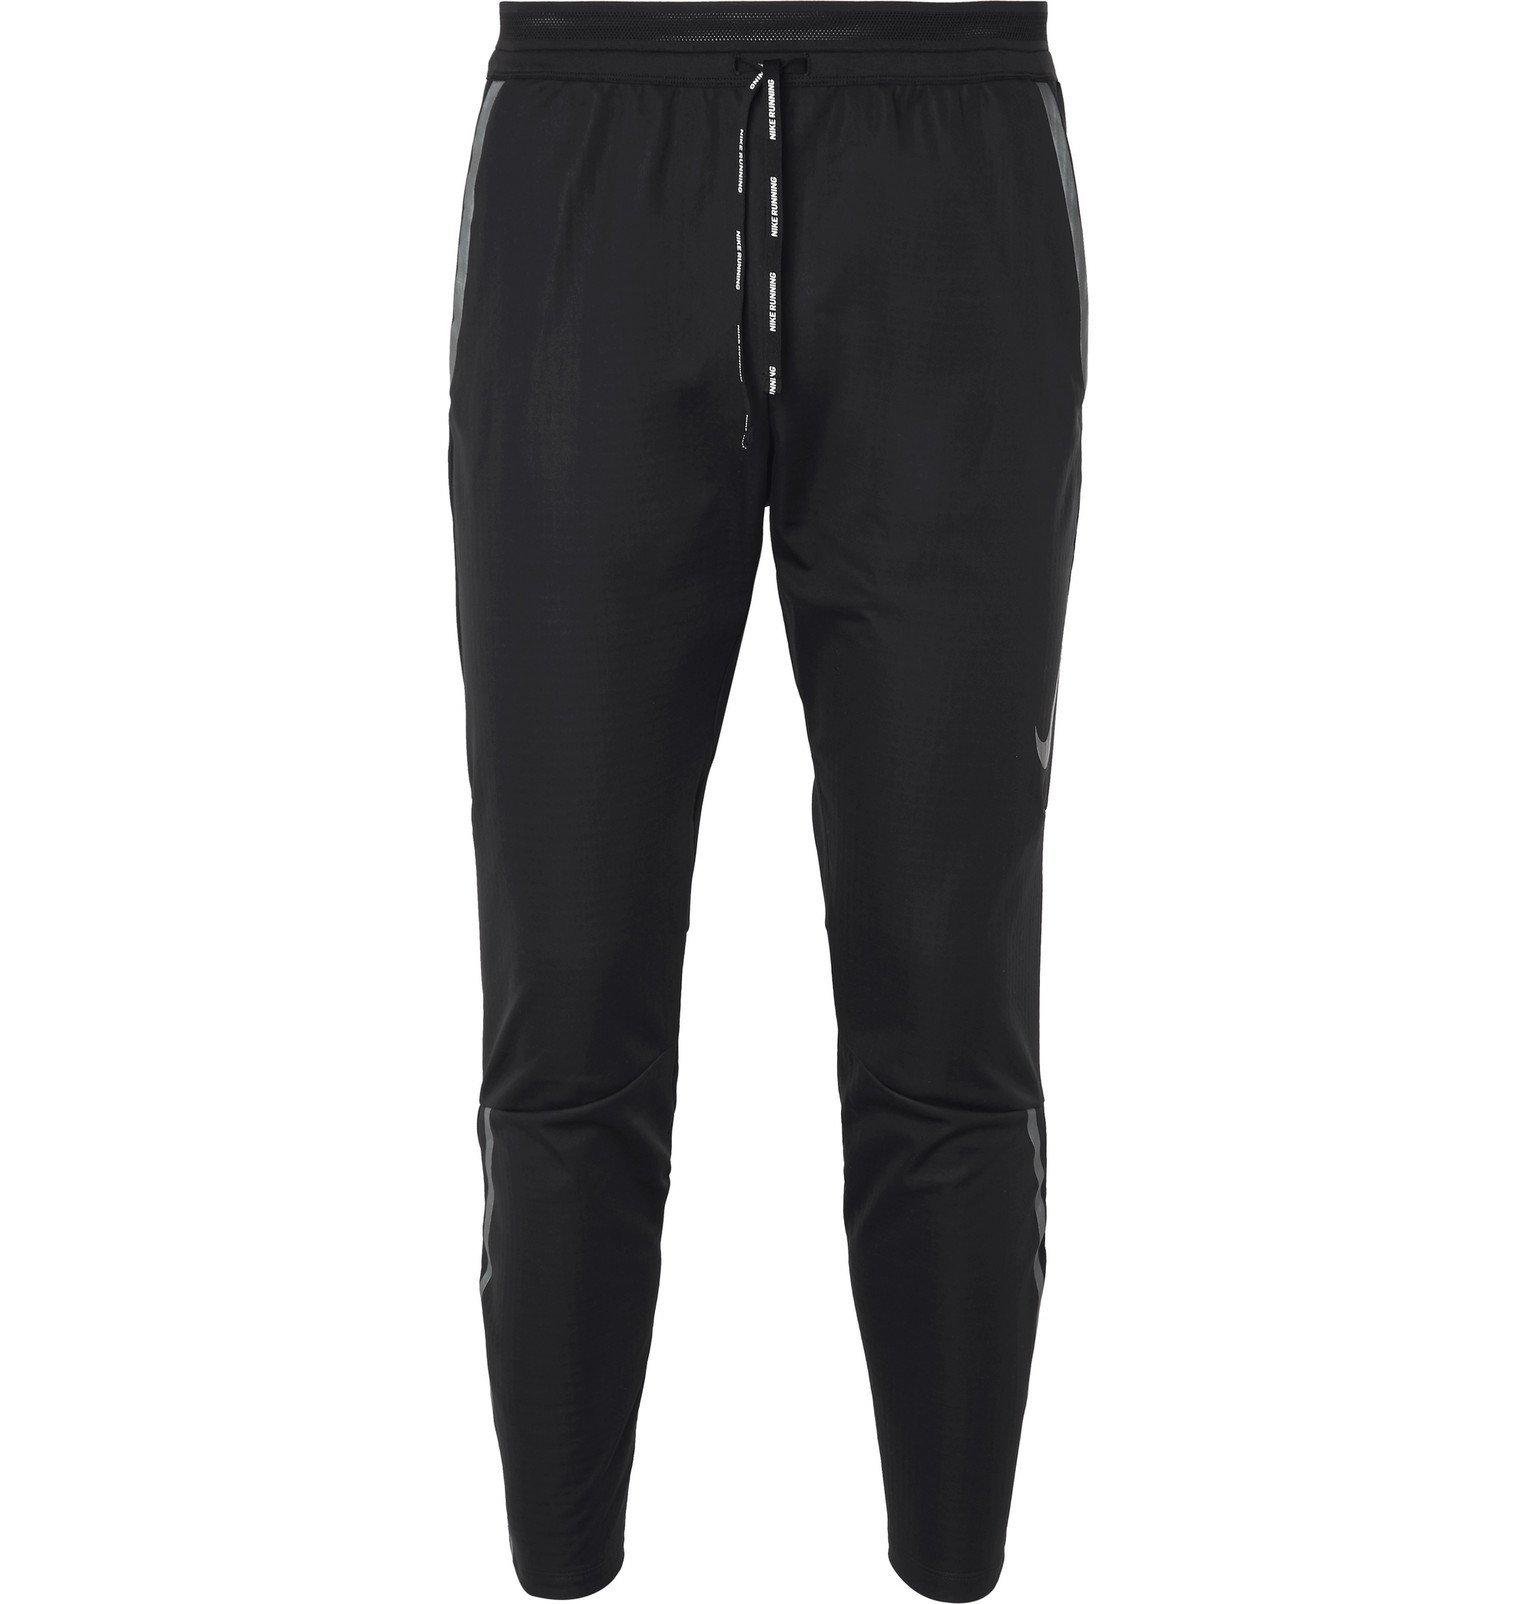 Nike Running - Shield Swift Tech-Jersey Track Pants - Black